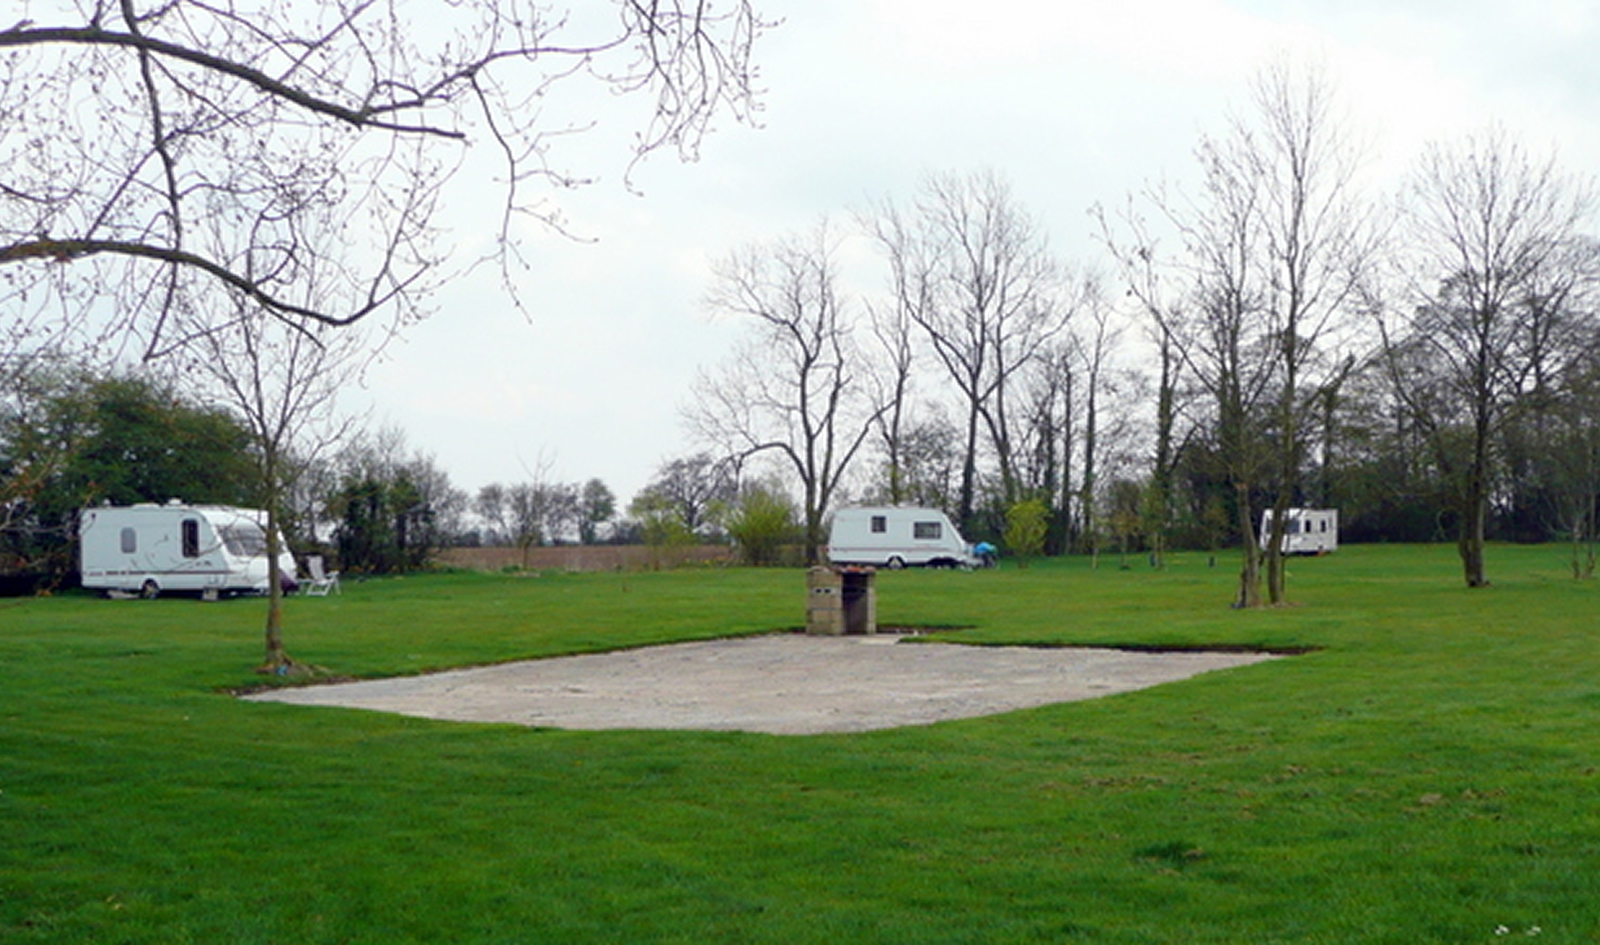 CL Caravan Site